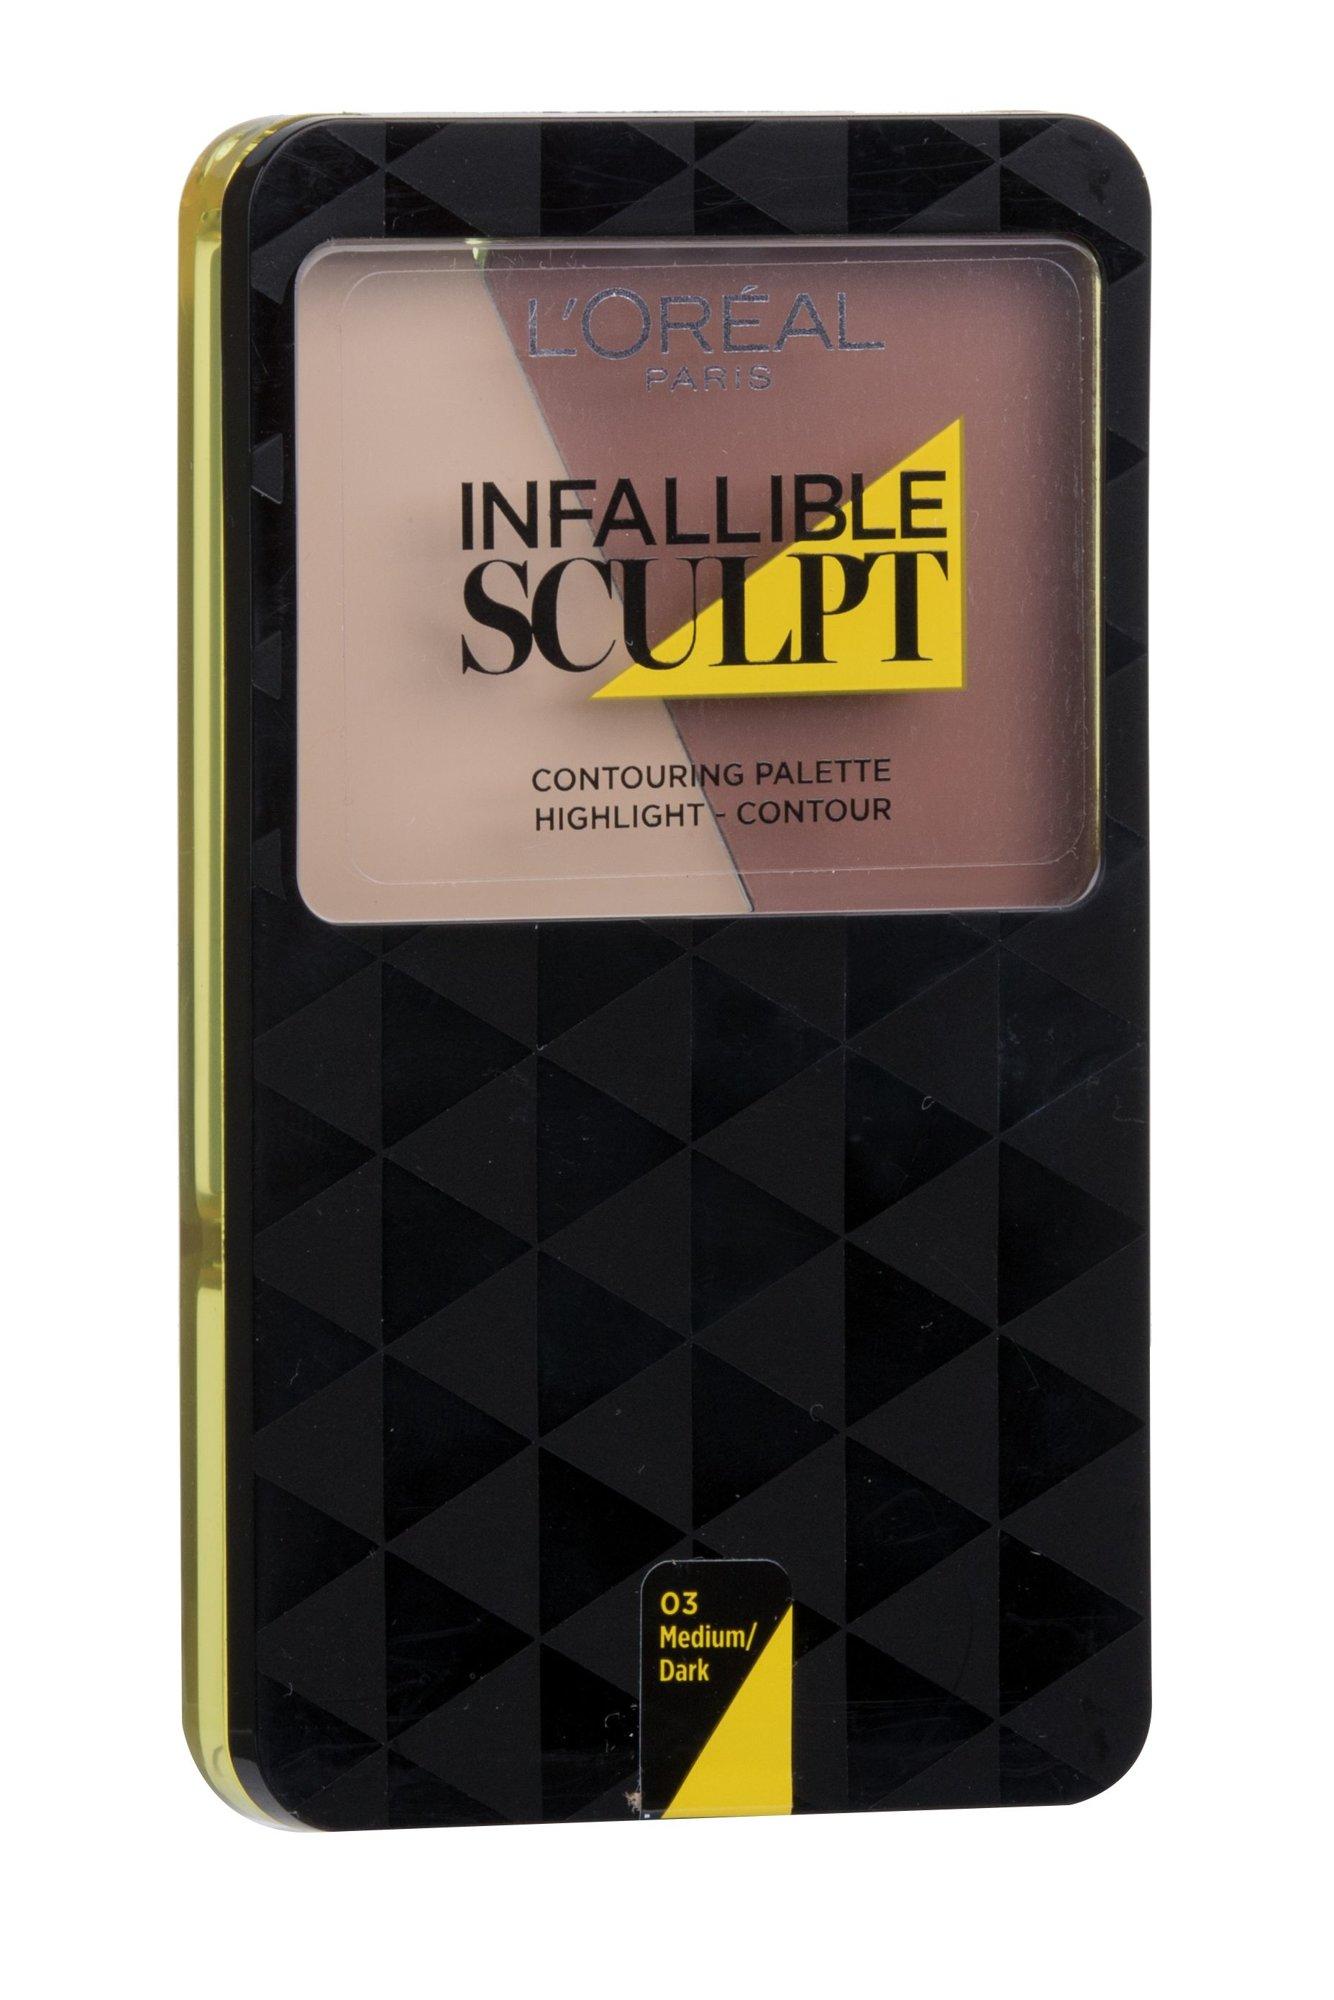 L´Oréal Paris Infallible Cosmetic 10ml 03 Medium/Dark